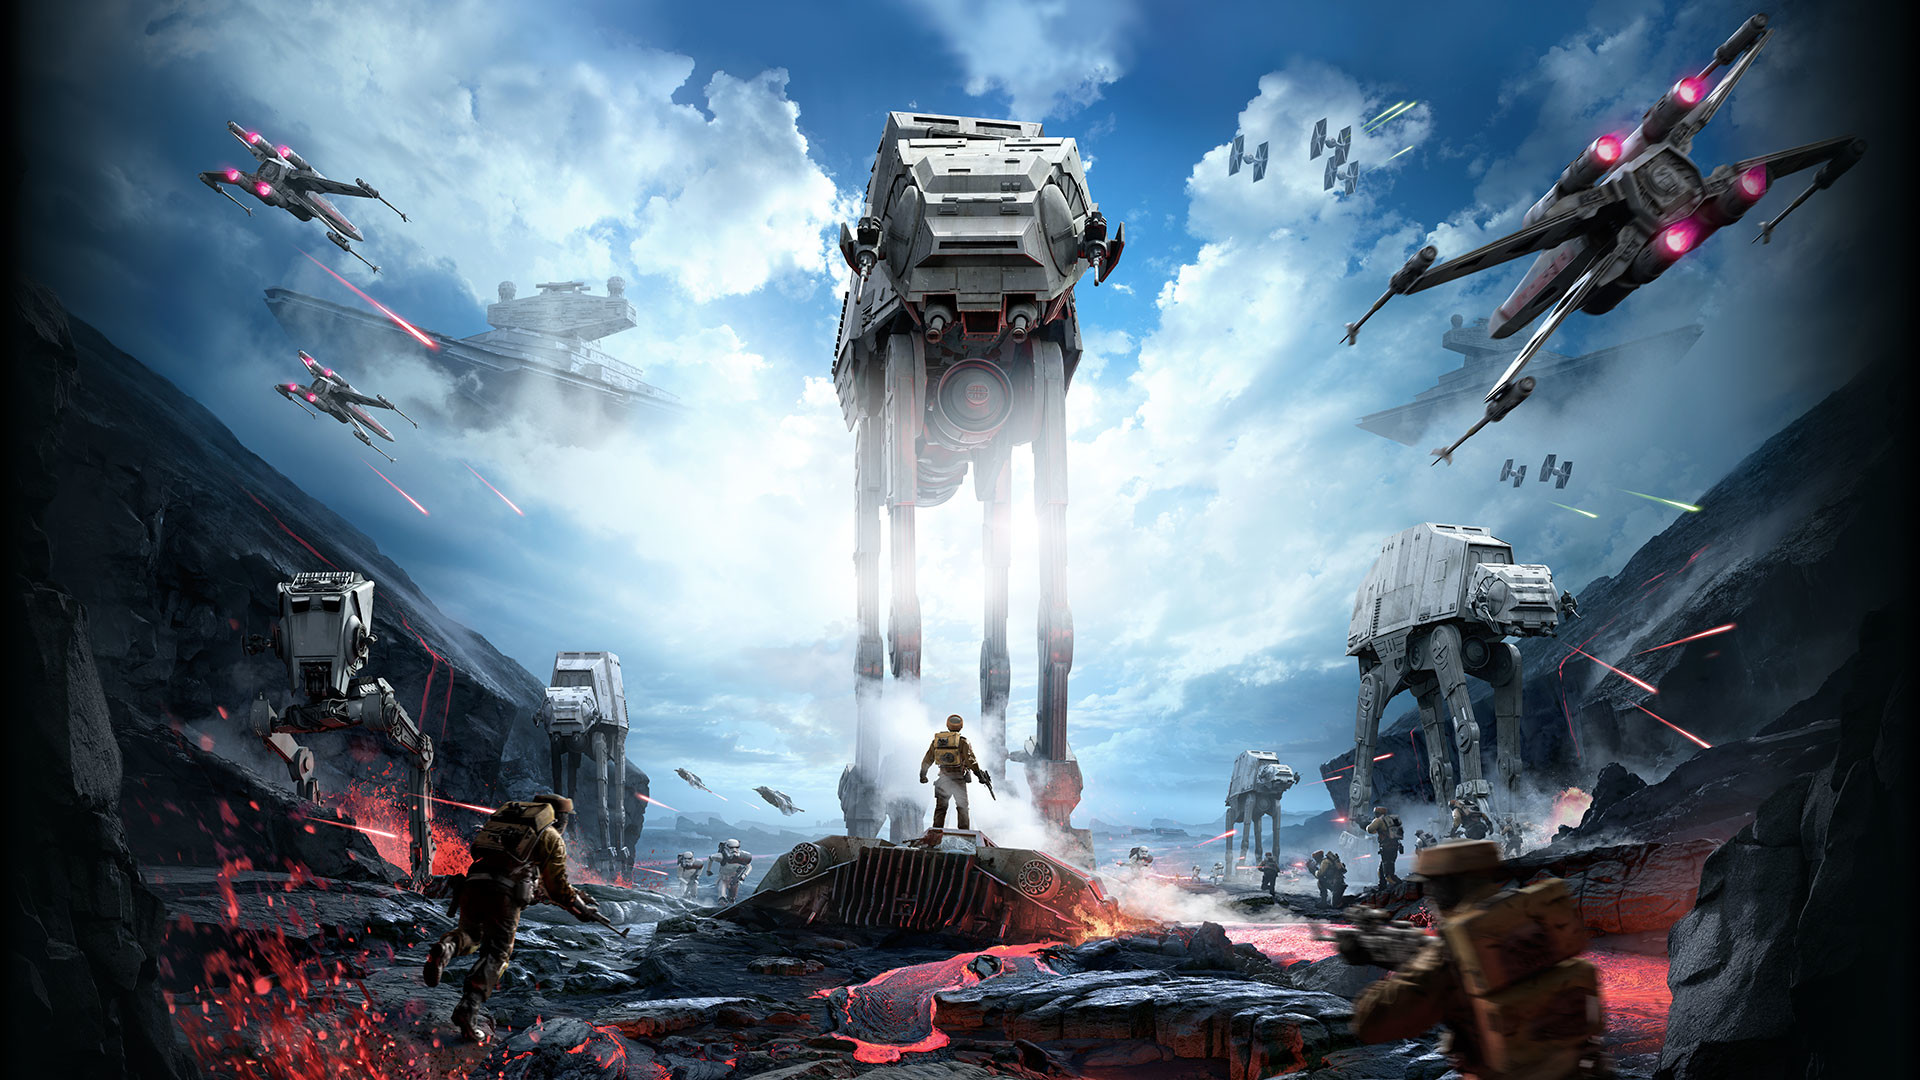 Star Wars - Star Wars Battlefront Wallpaper 4k - 1920x1080 ...